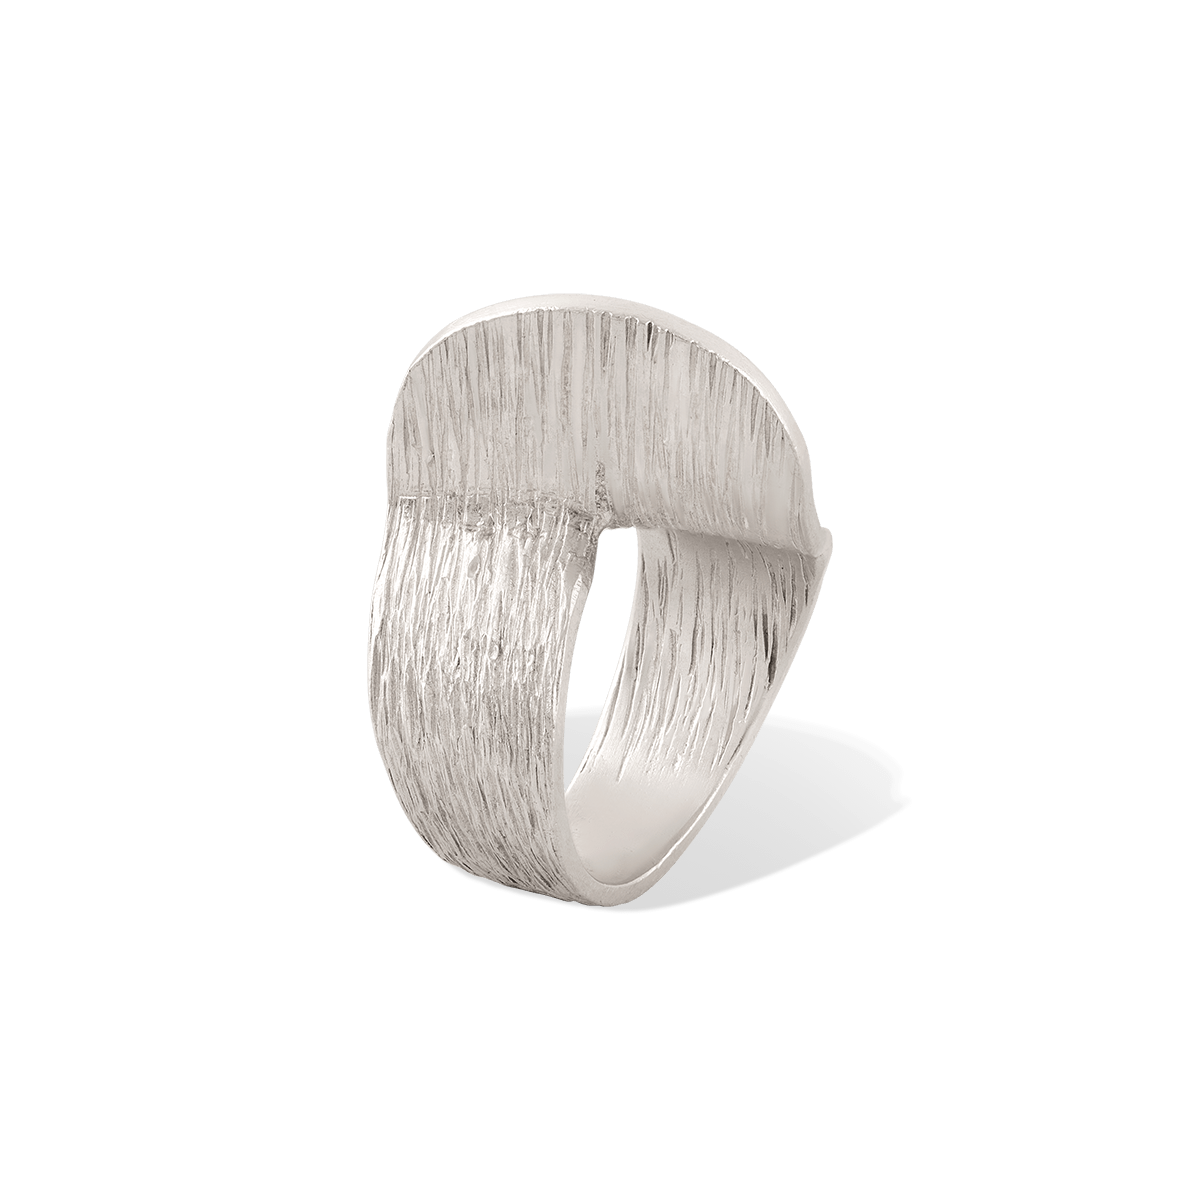 انگشتر نقره منحنی